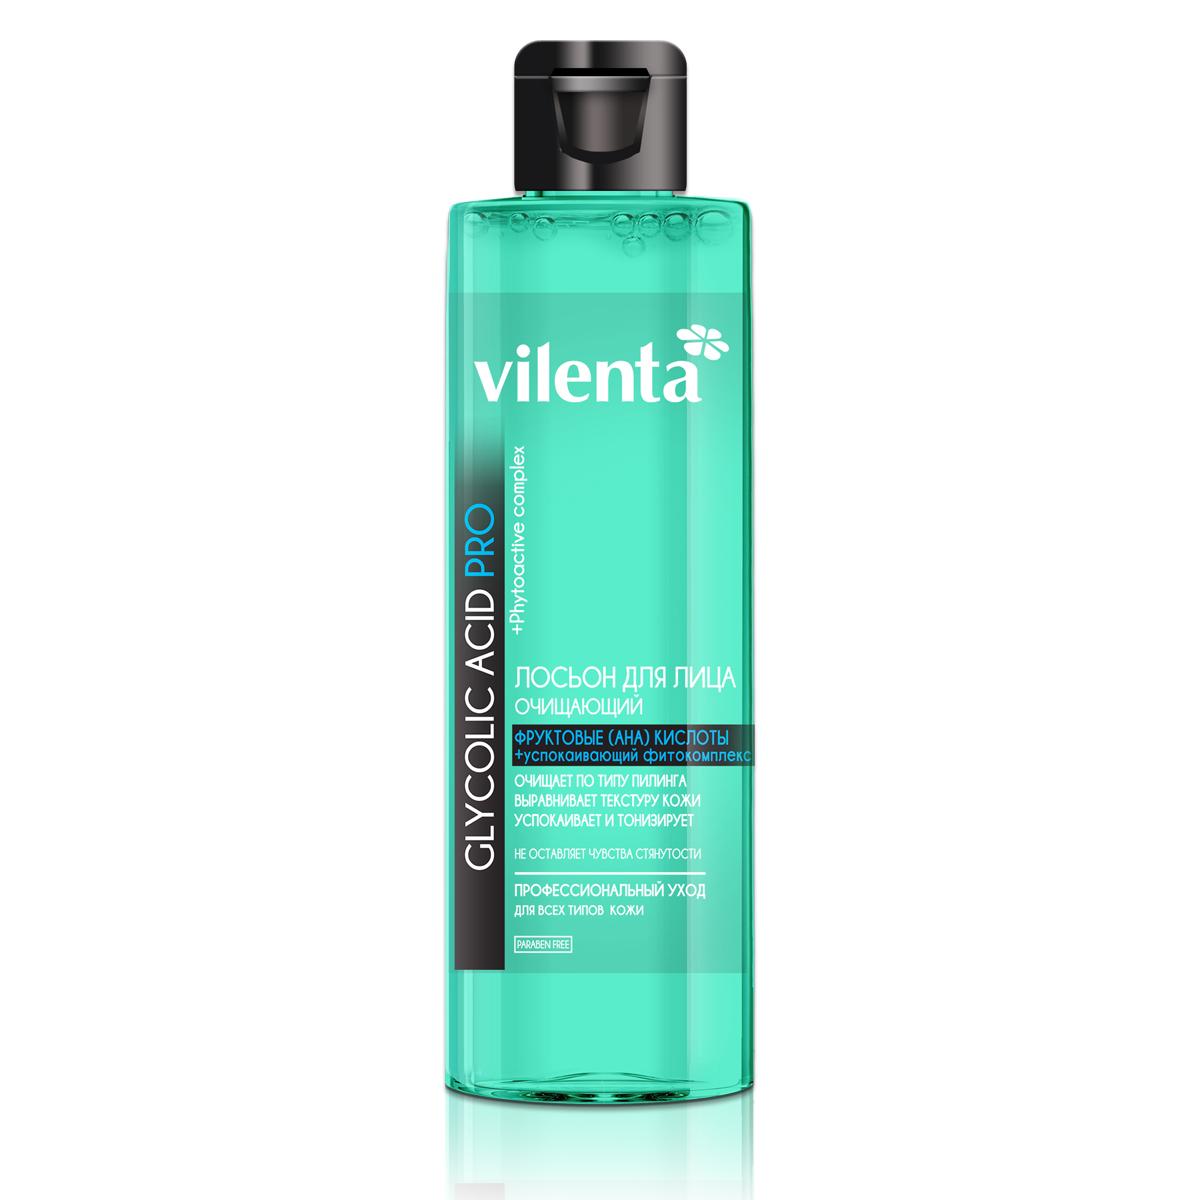 Vilenta Лосьон для лица Очищающий Glycolic Acid Pro, 200 мл